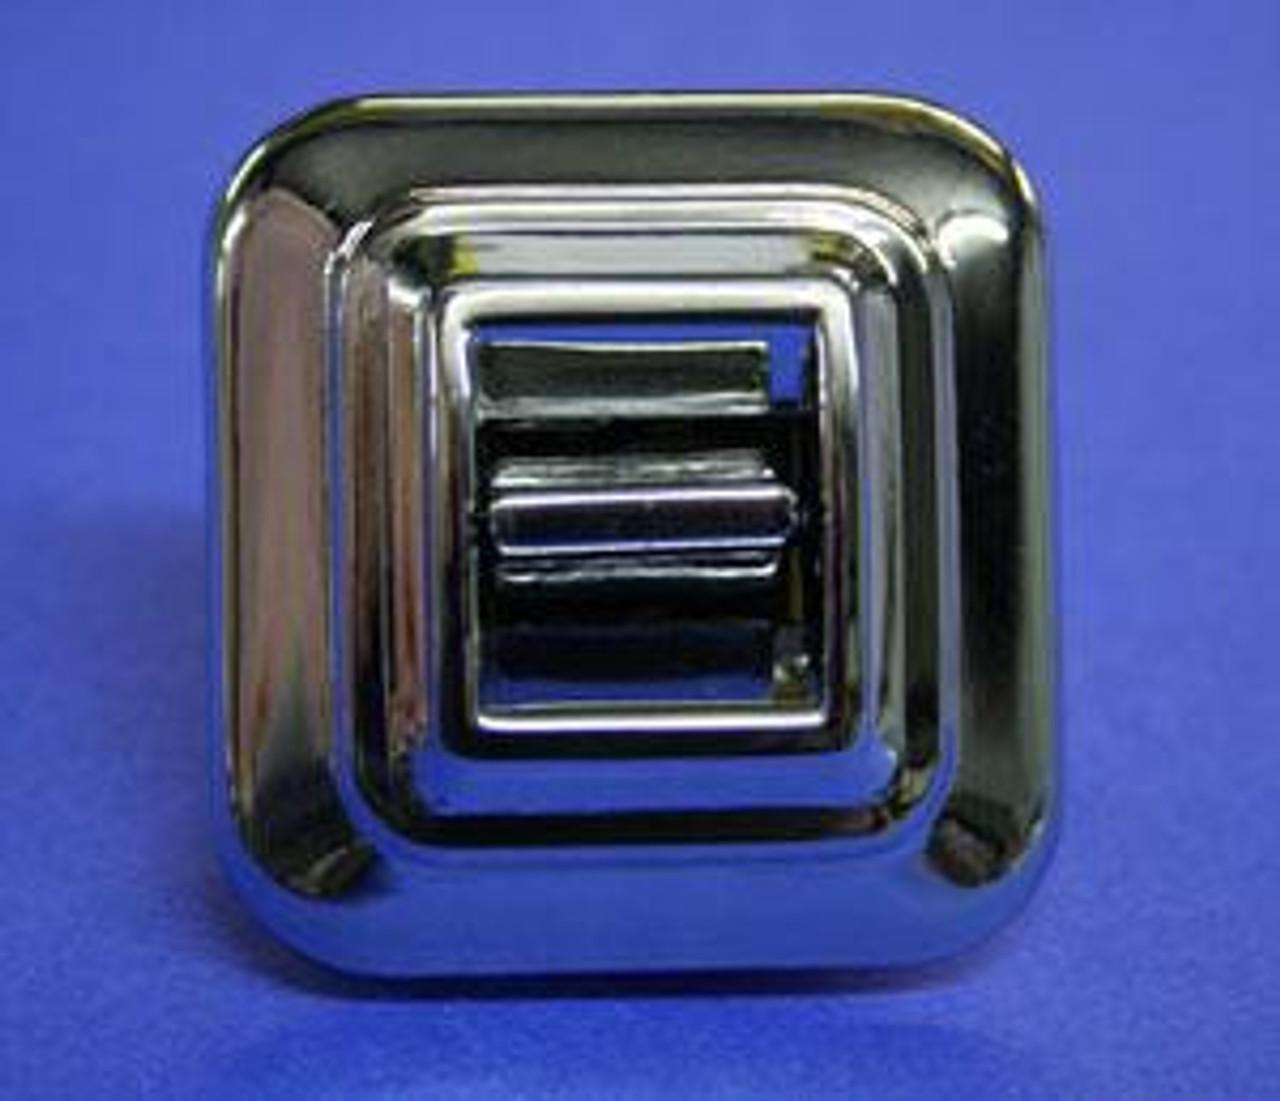 1964-72 Chevelle Or El Camino Power Window Switch (1 button)